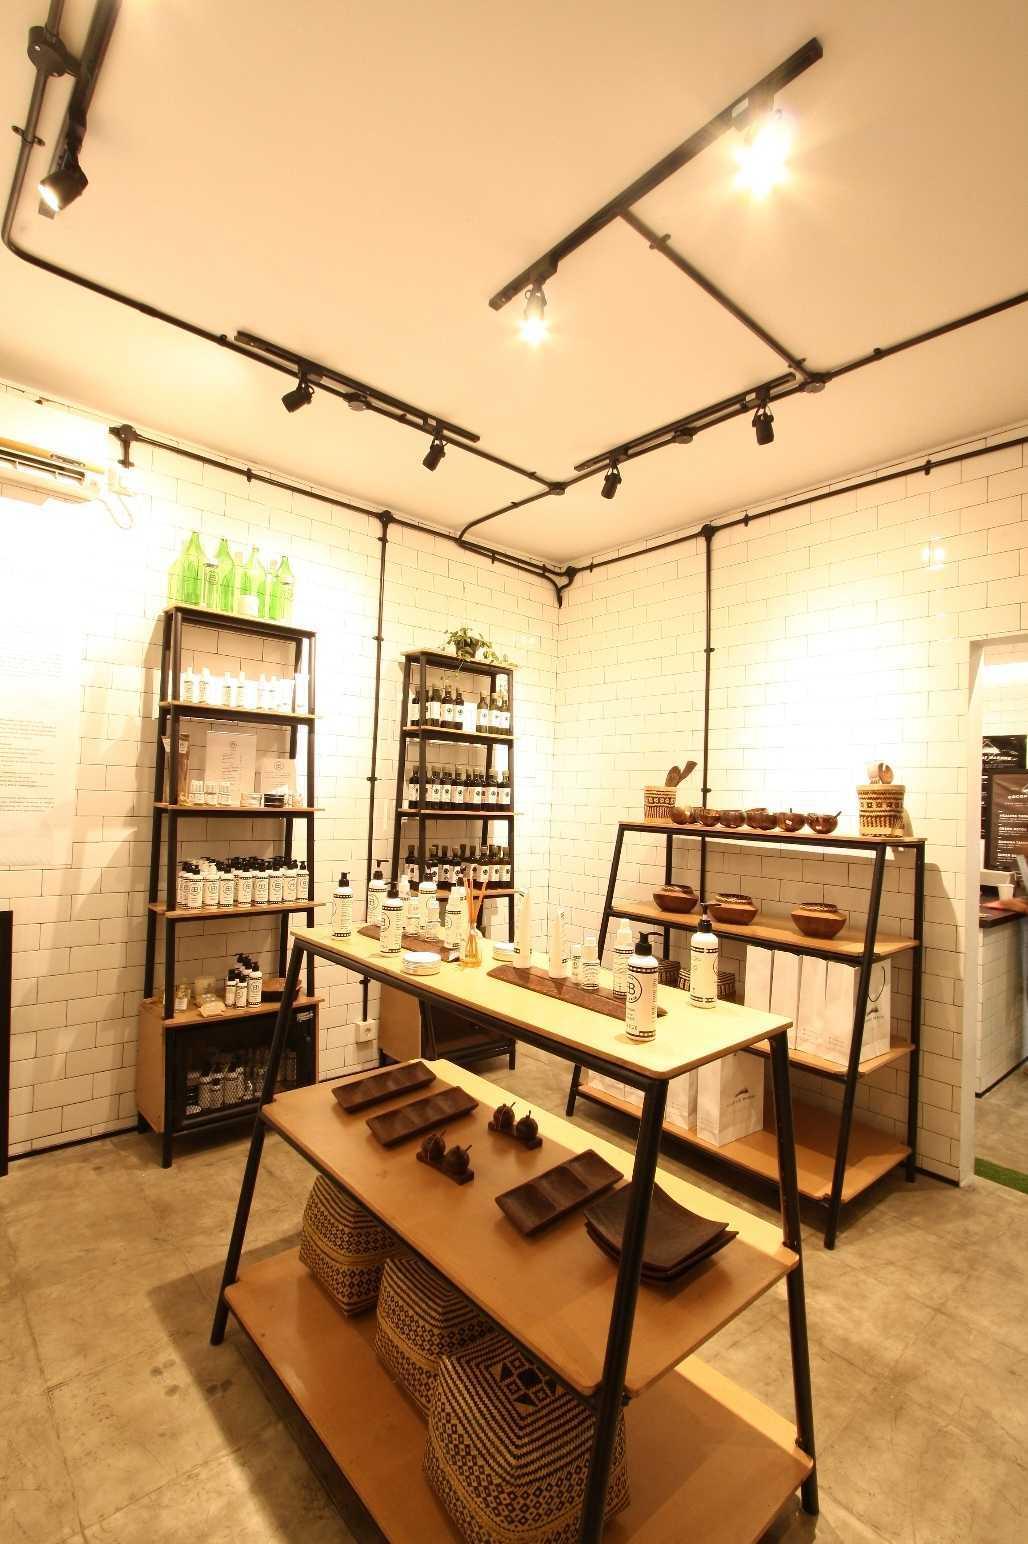 Ddap Architect Coconut Warung Shop & Cafe Ubud, Kabupaten Gianyar, Bali, Indonesia Bali Img0861 Industrial  28558